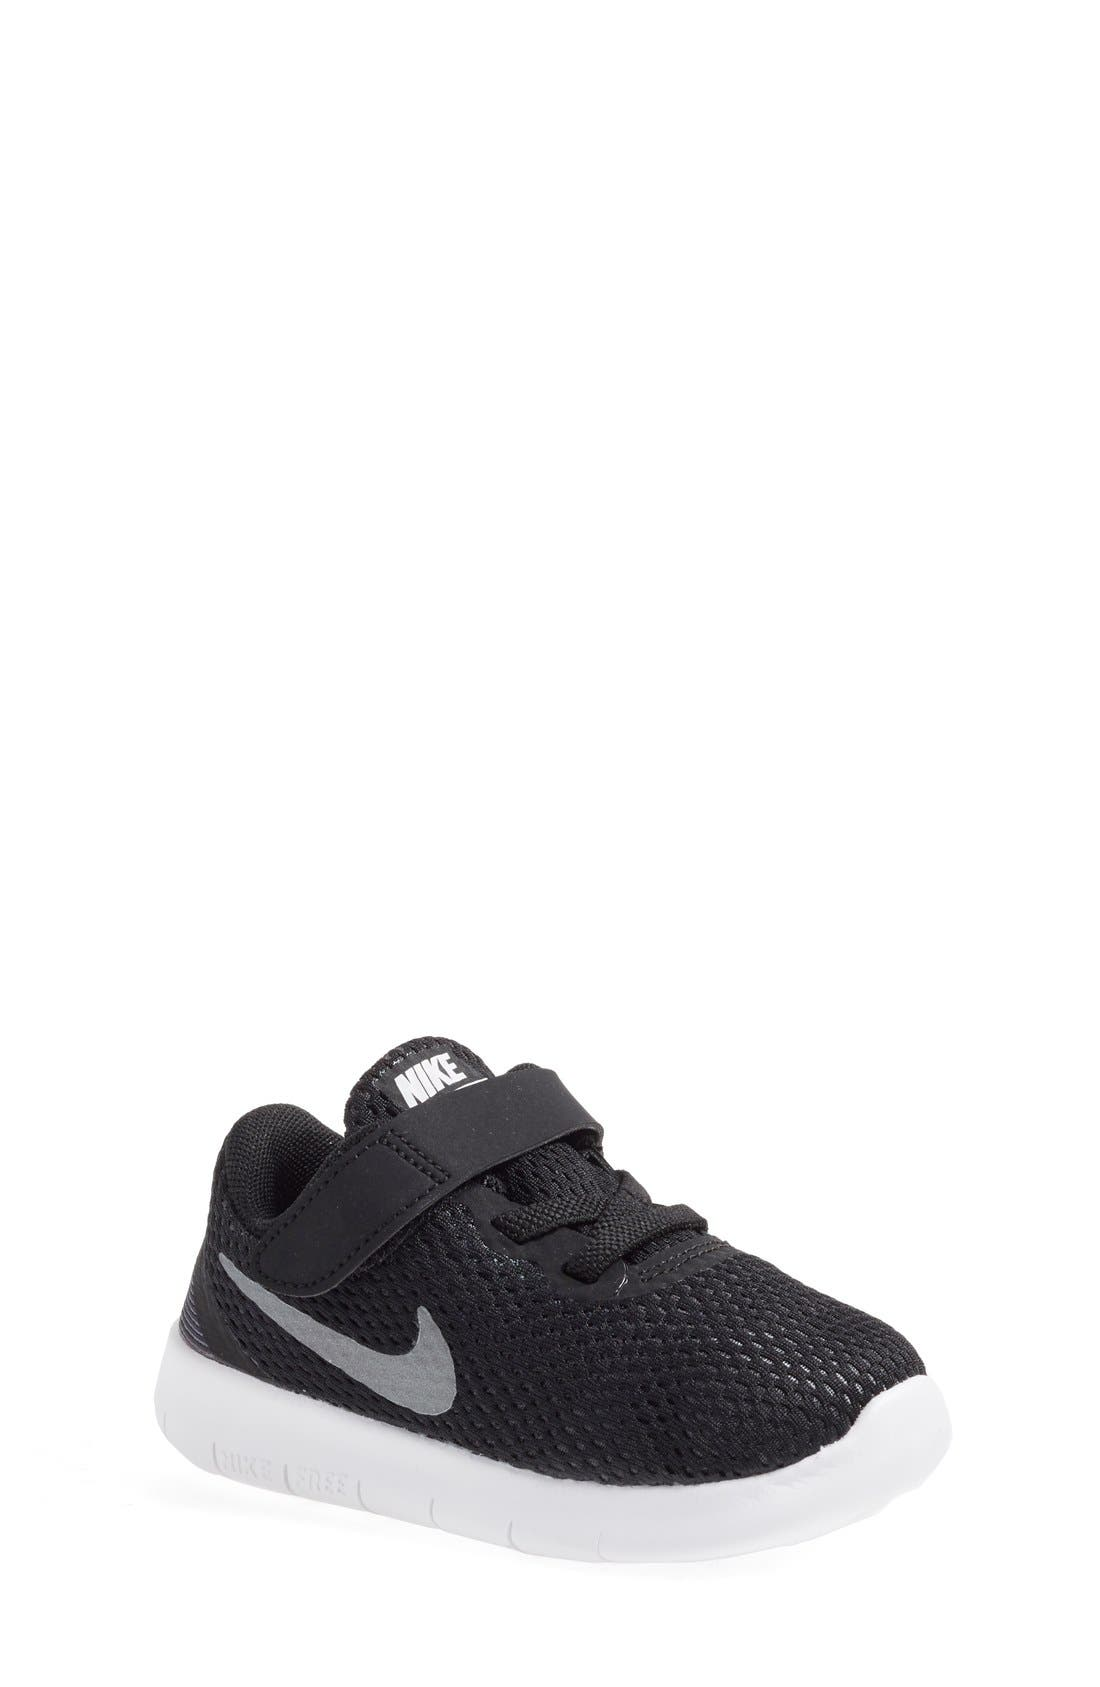 NIKE, Free RN Sneaker, Main thumbnail 1, color, 001